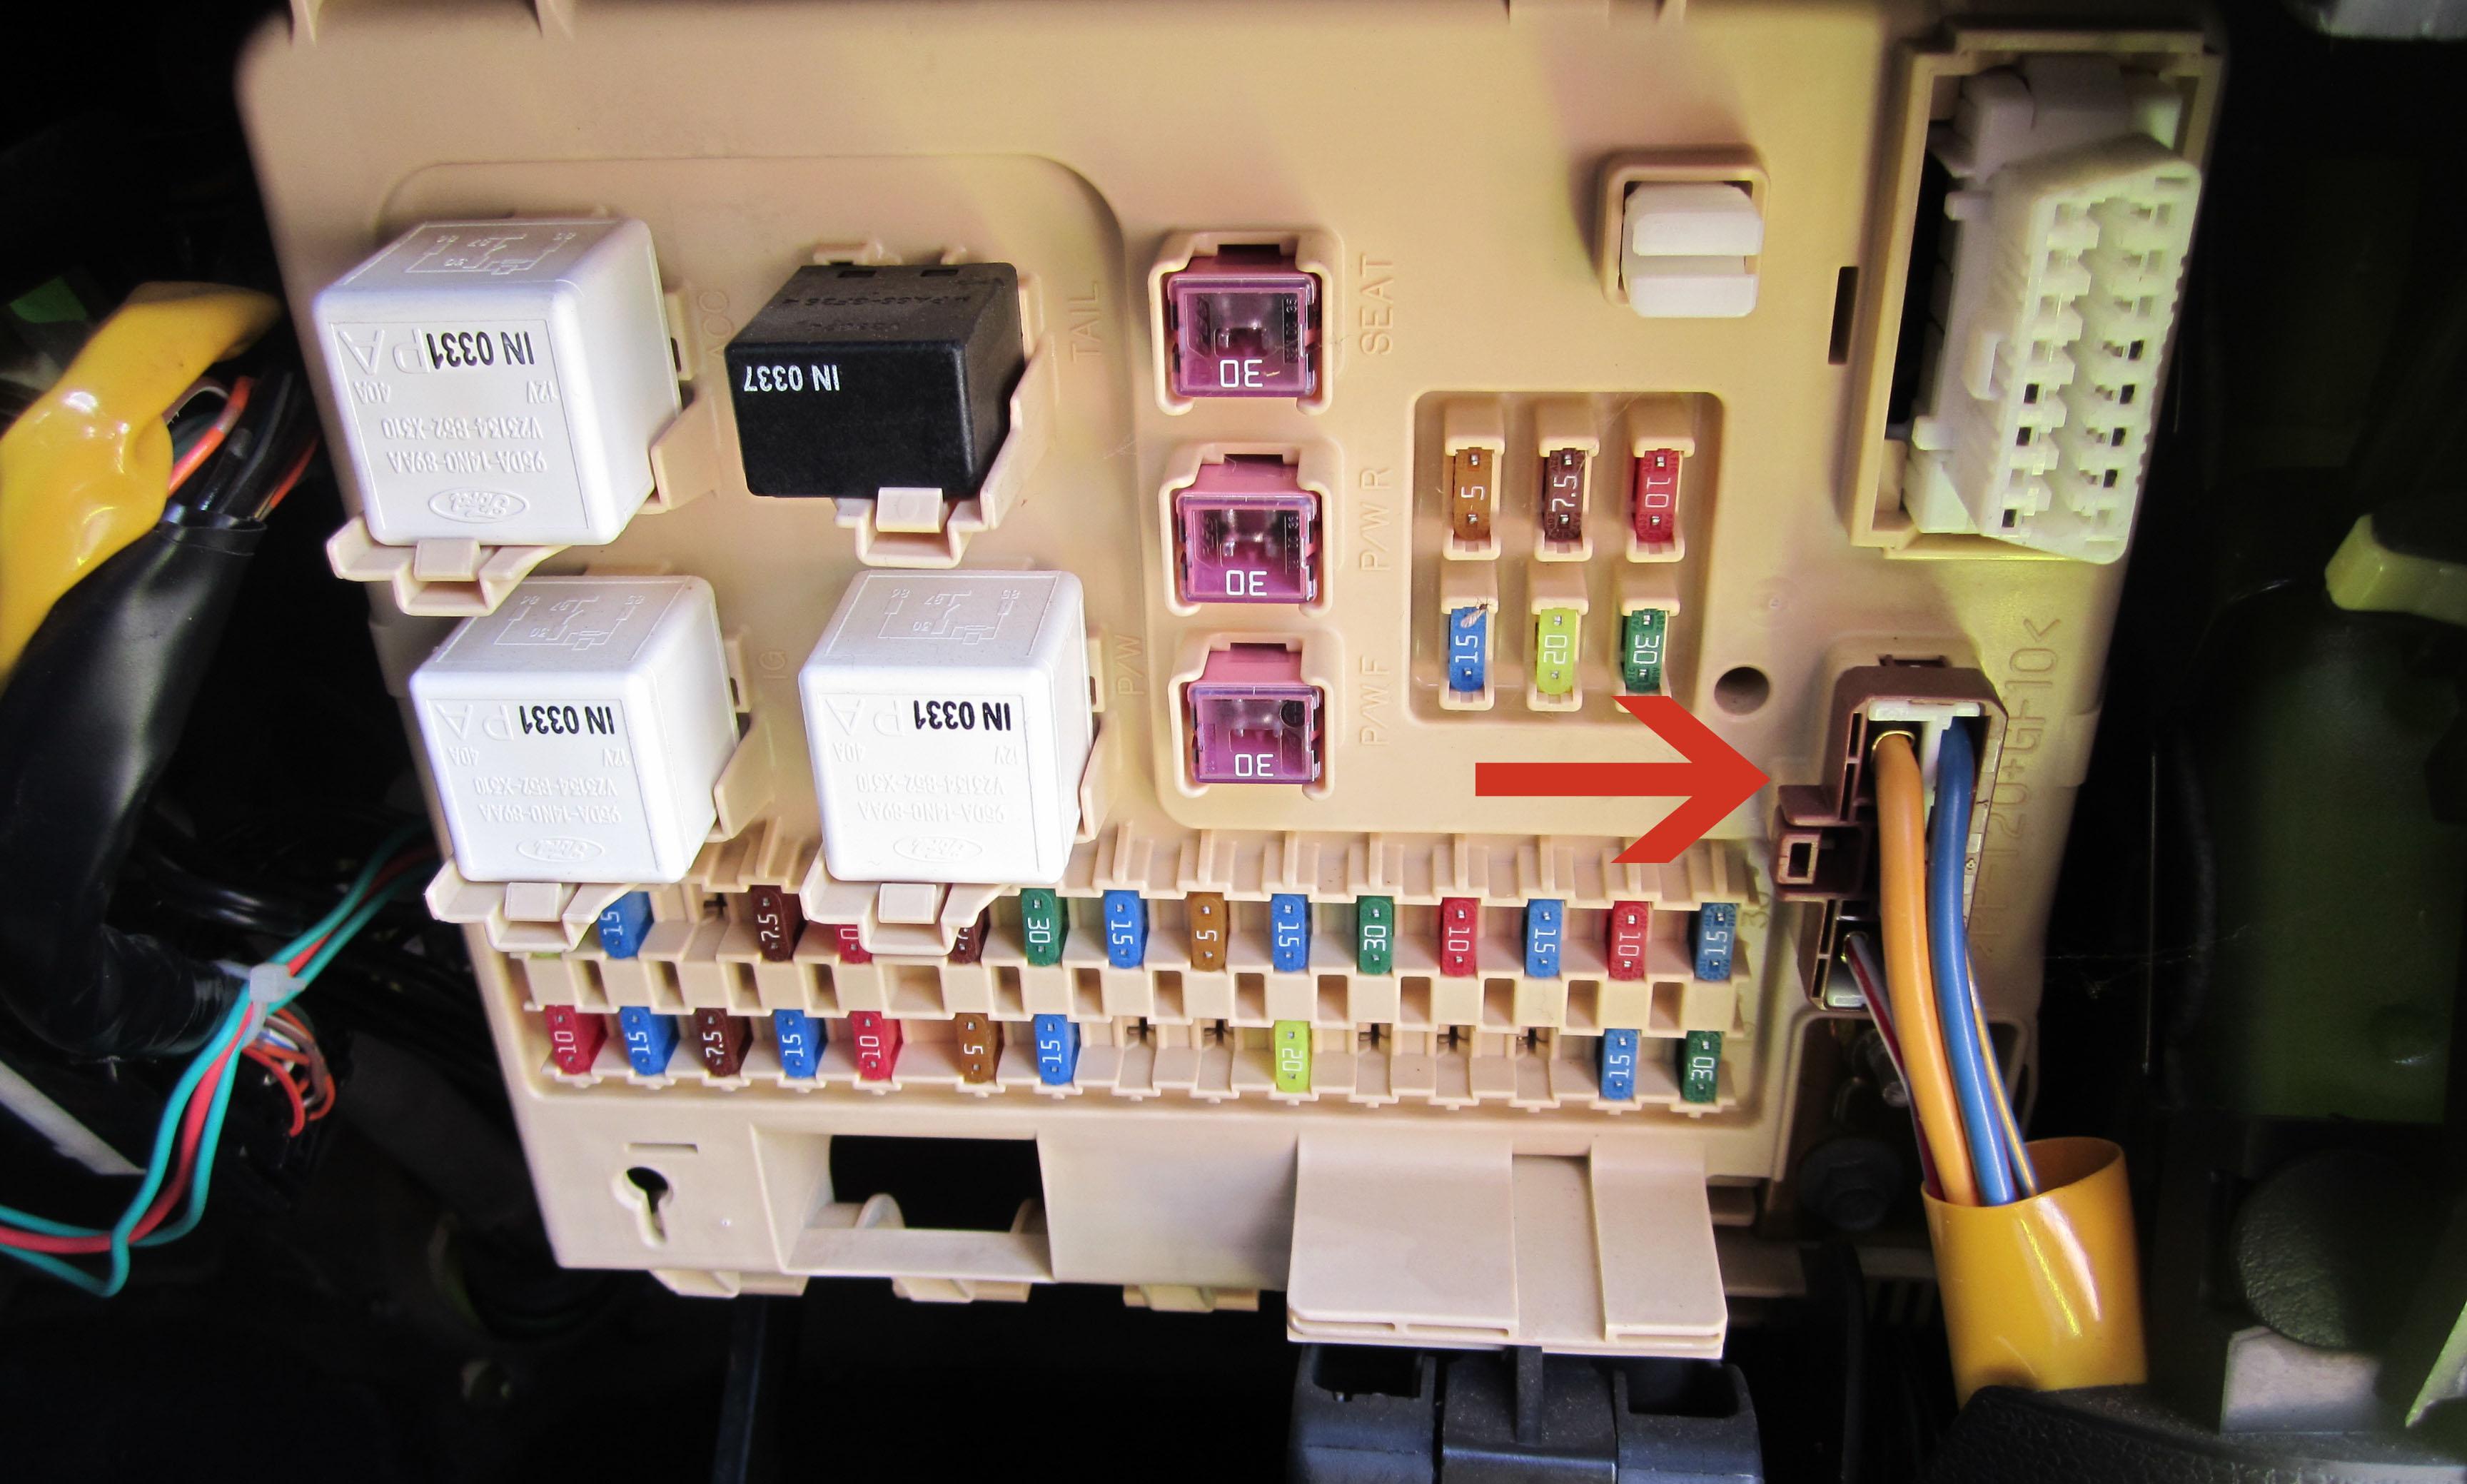 hight resolution of ford falcon xt fuse box wiring diagram fascinatingau ford fuse box diagram 18